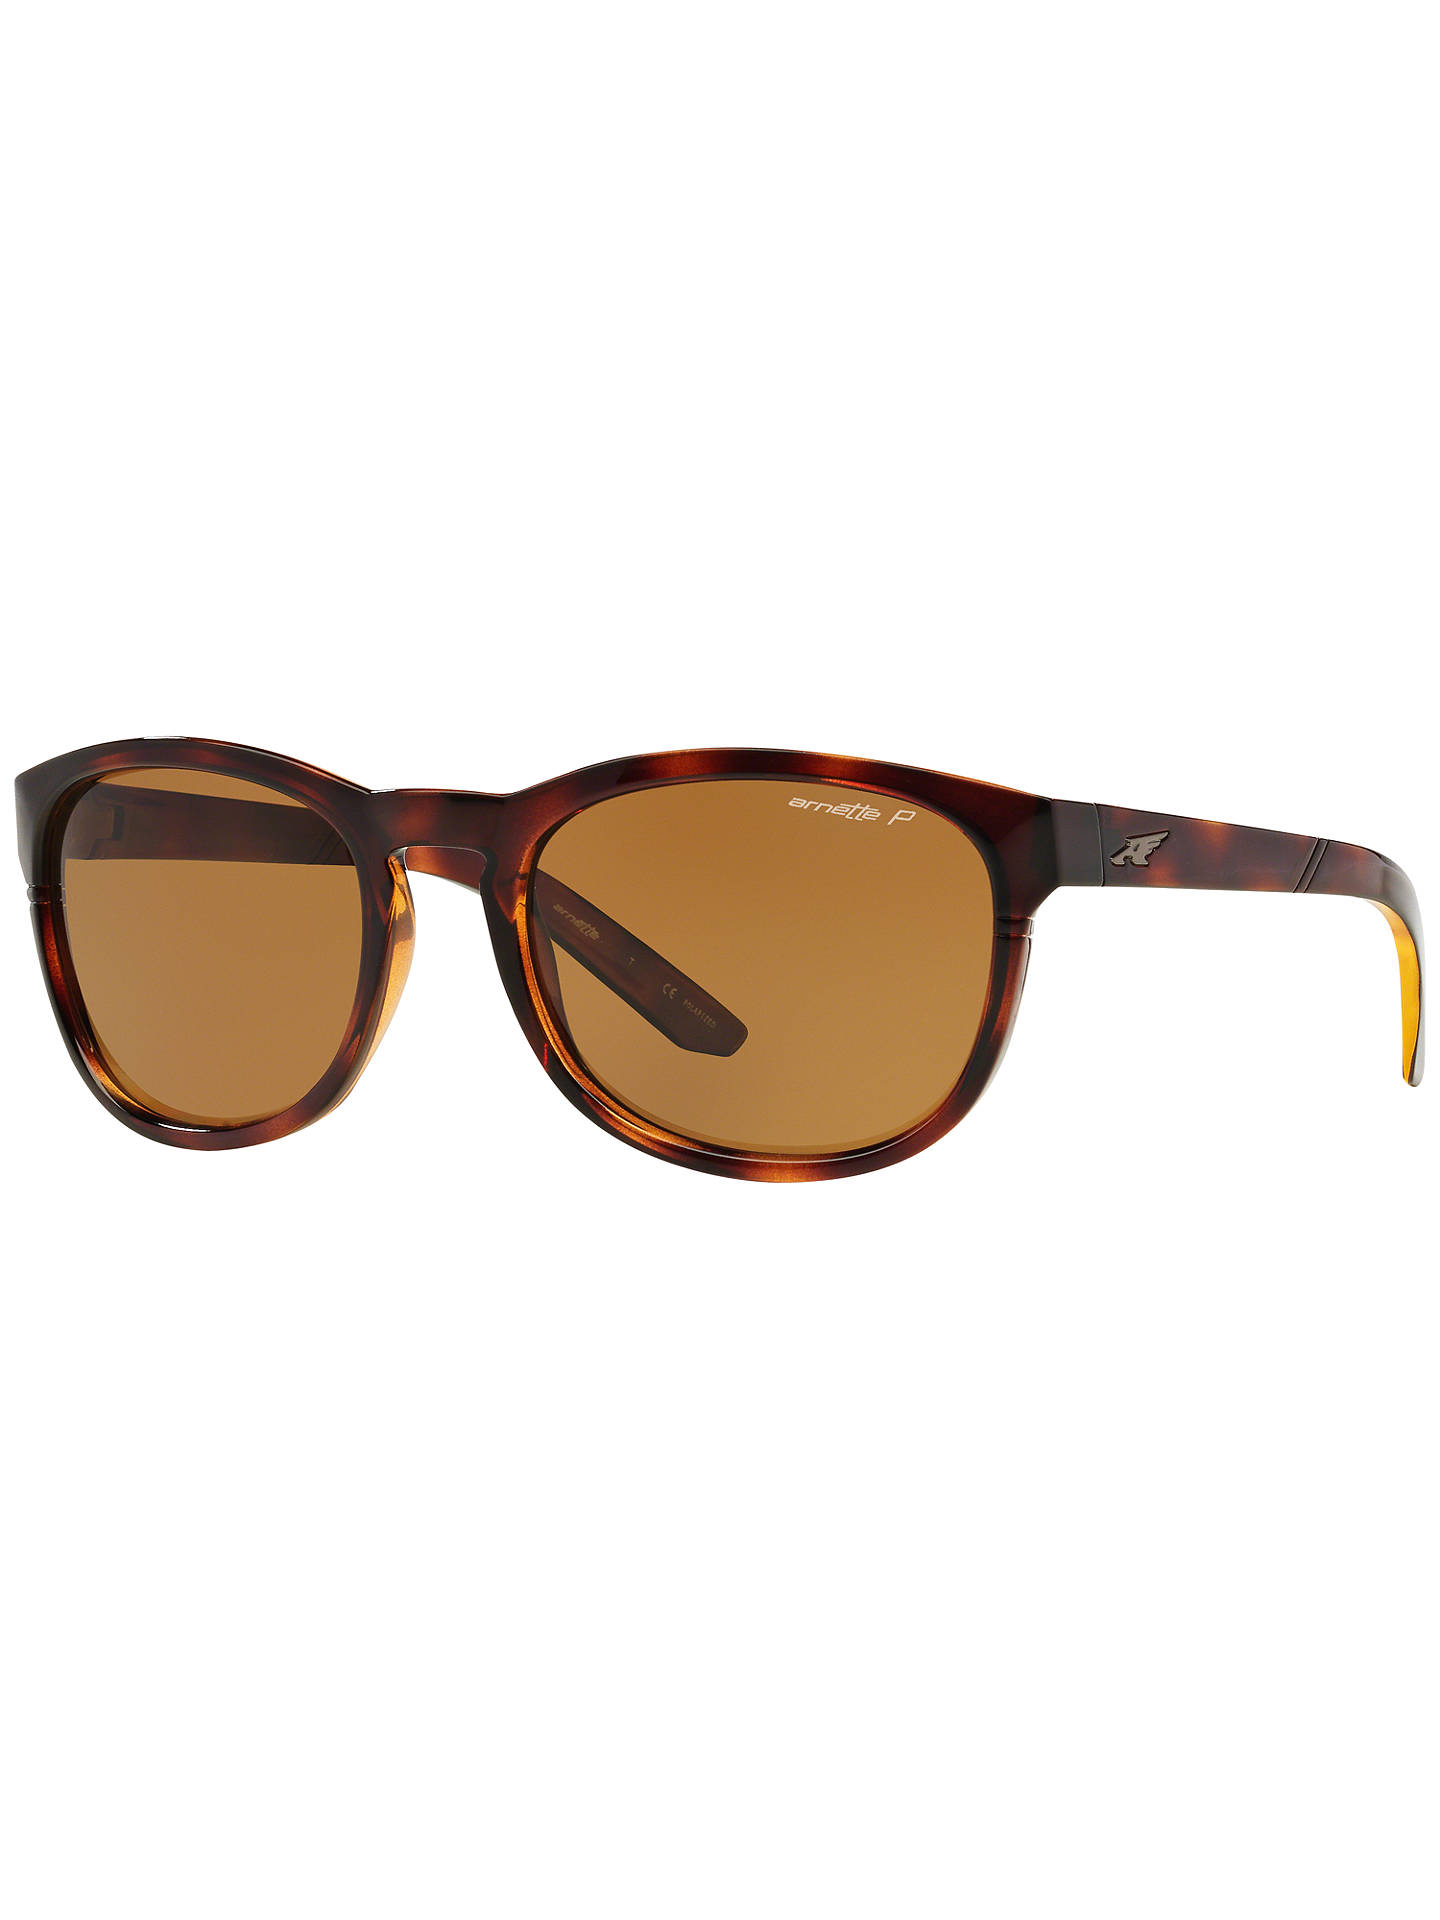 BuyArnette AN4219 Pleasantville Polarised Sunglasses, Tortoise Online at  johnlewis.com ... 789fff50d6